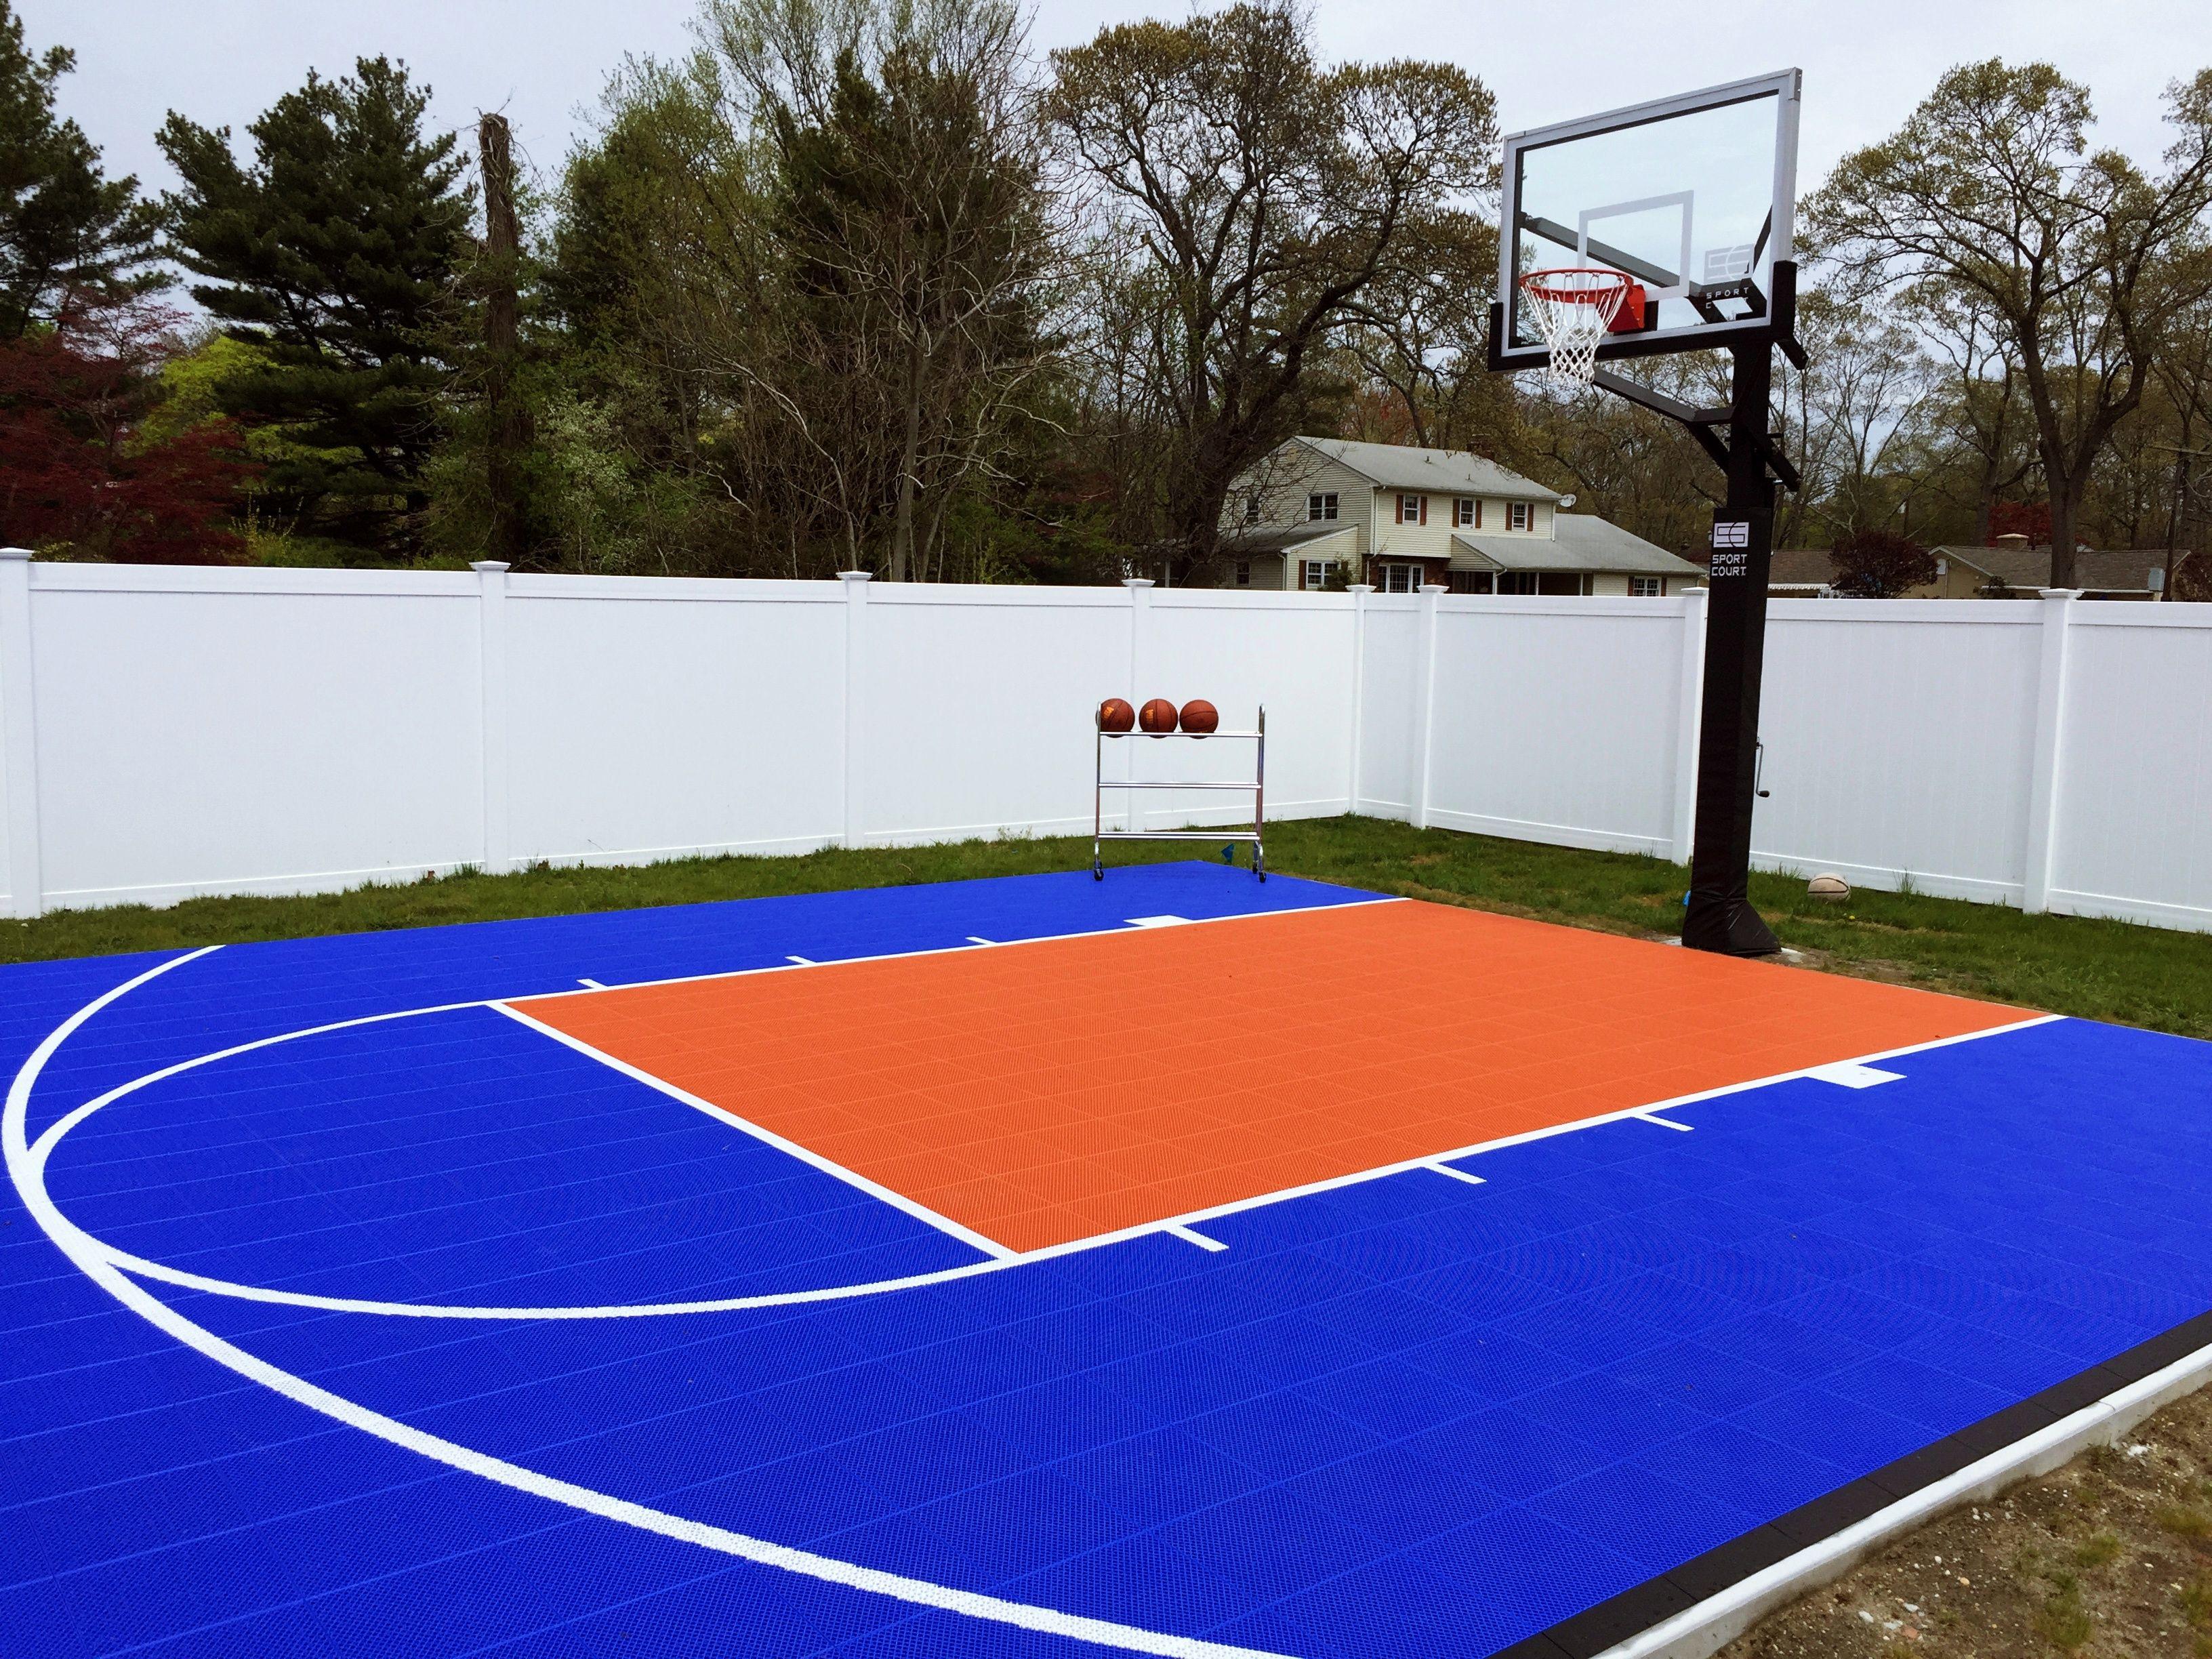 Outdoor residential Sport Court by SportProsUSA | Sport ...